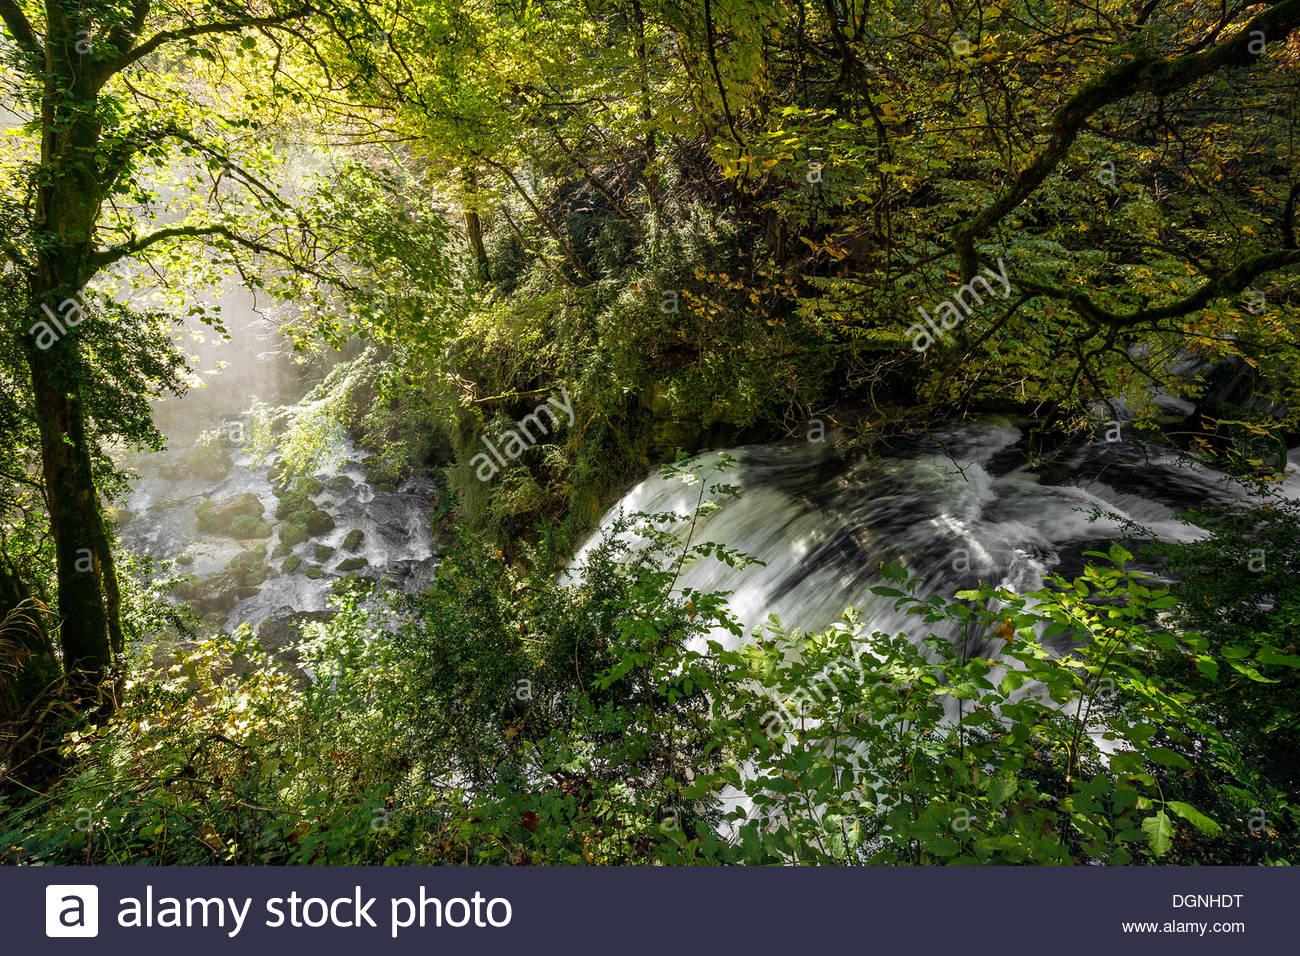 les-cuves-de-sassenage-the-furon-canyon-